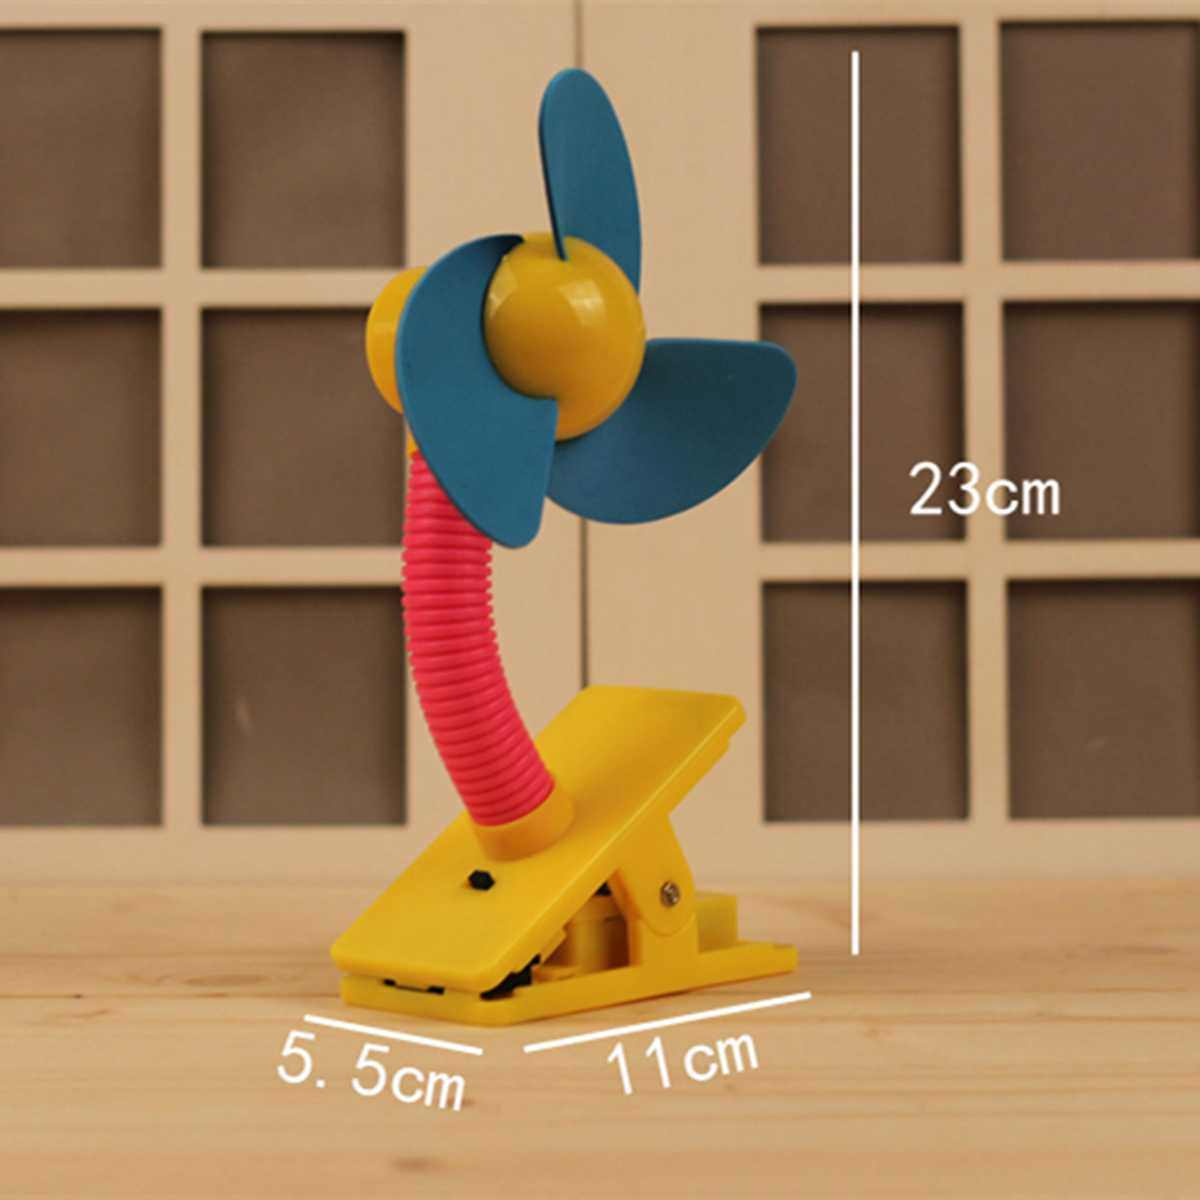 Mini Mute พัดลมแบบชาร์จไฟได้สำหรับรถเข็นเด็กทารกพัดลมแบบพกพา Cooling Table Fan ความปลอดภัยคลิป - บนรถเข็นเด็กอุปกรณ์เสริม